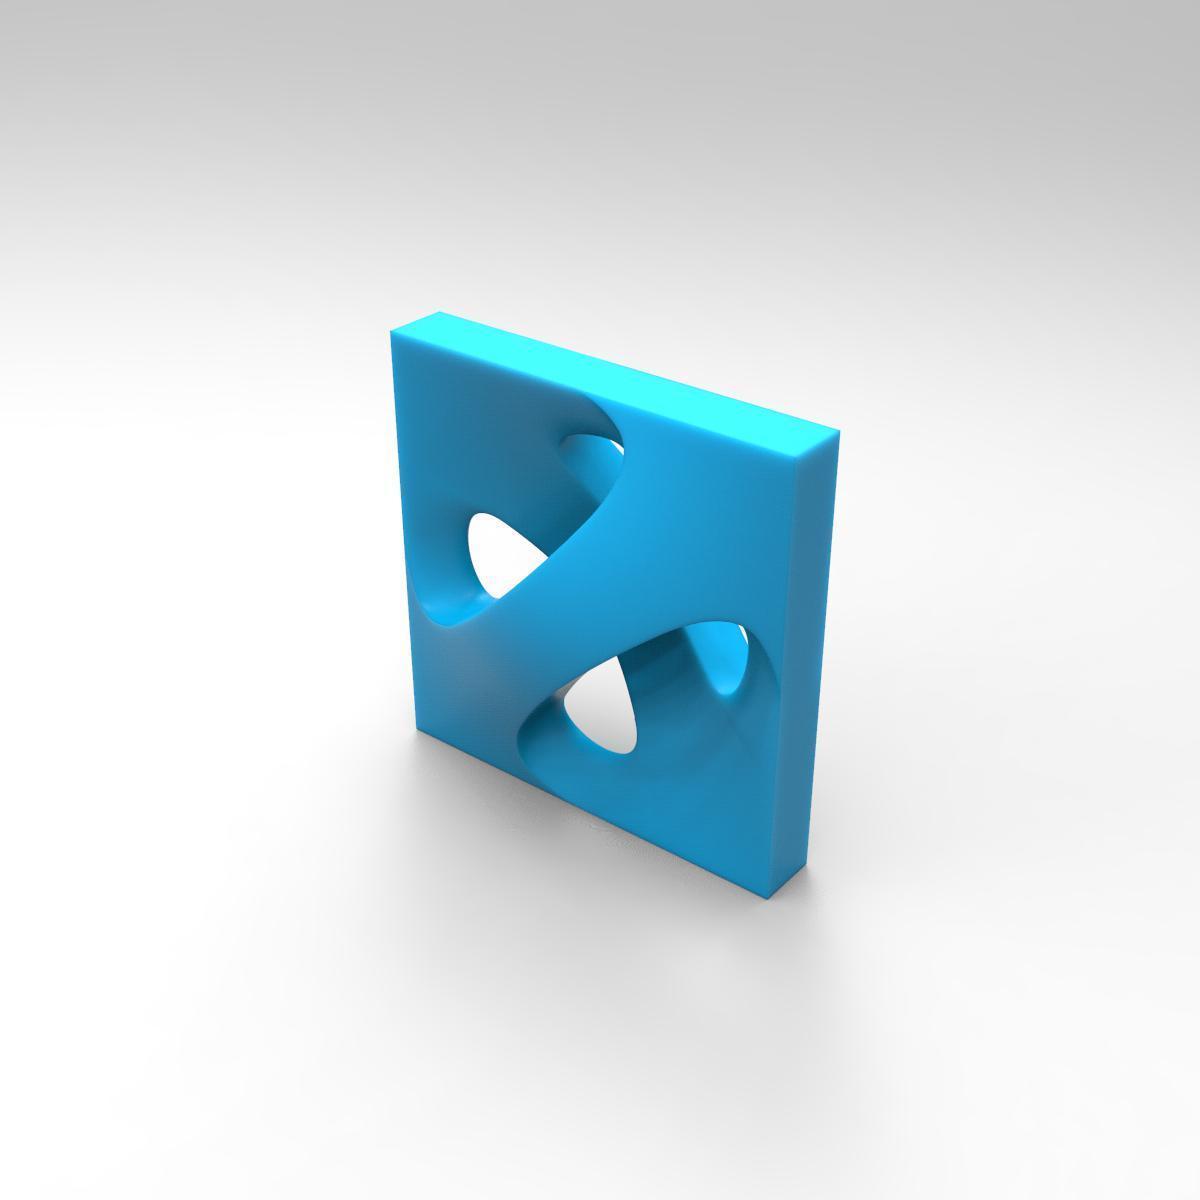 JPG__untitled.30.jpg Download STL file Modular unit • Model to 3D print, 6cubes